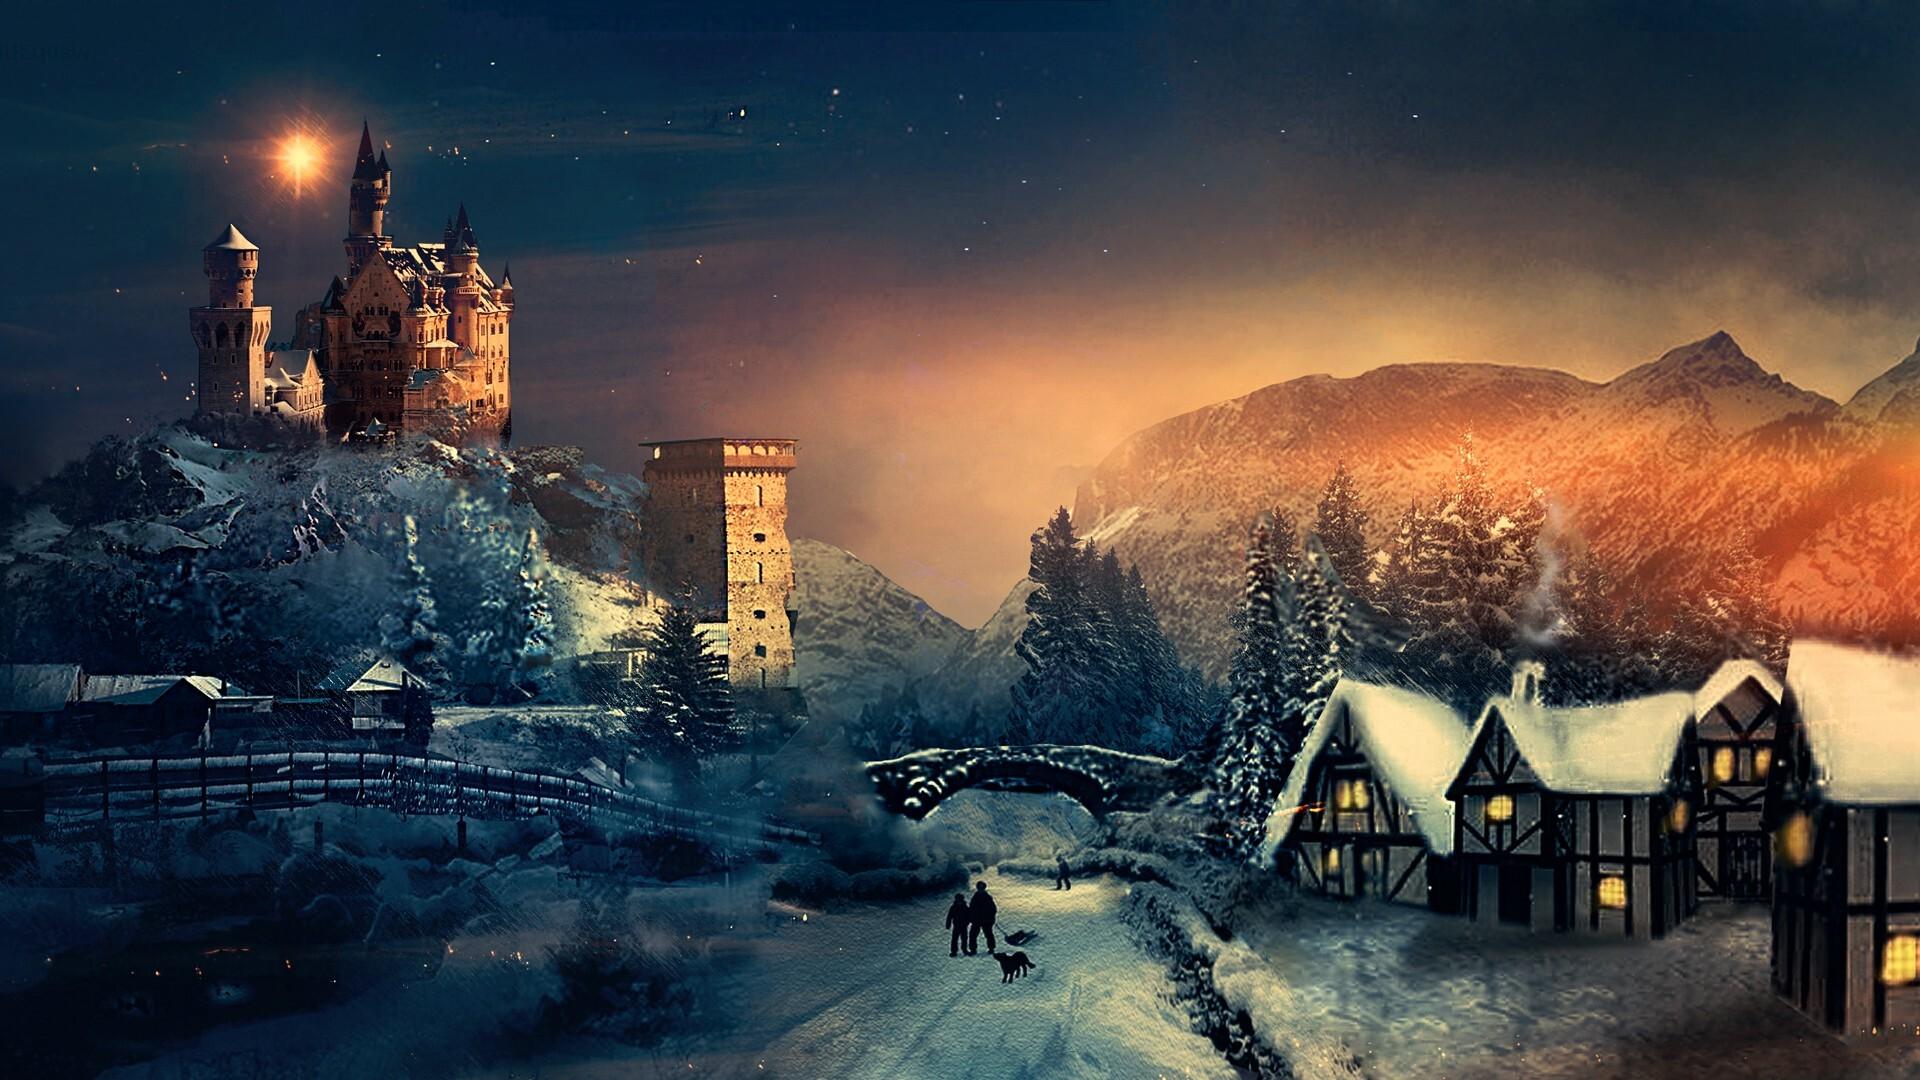 1920x1080 christmas winter season laptop full hd 1080p hd - Hd christmas wallpapers 1080p ...